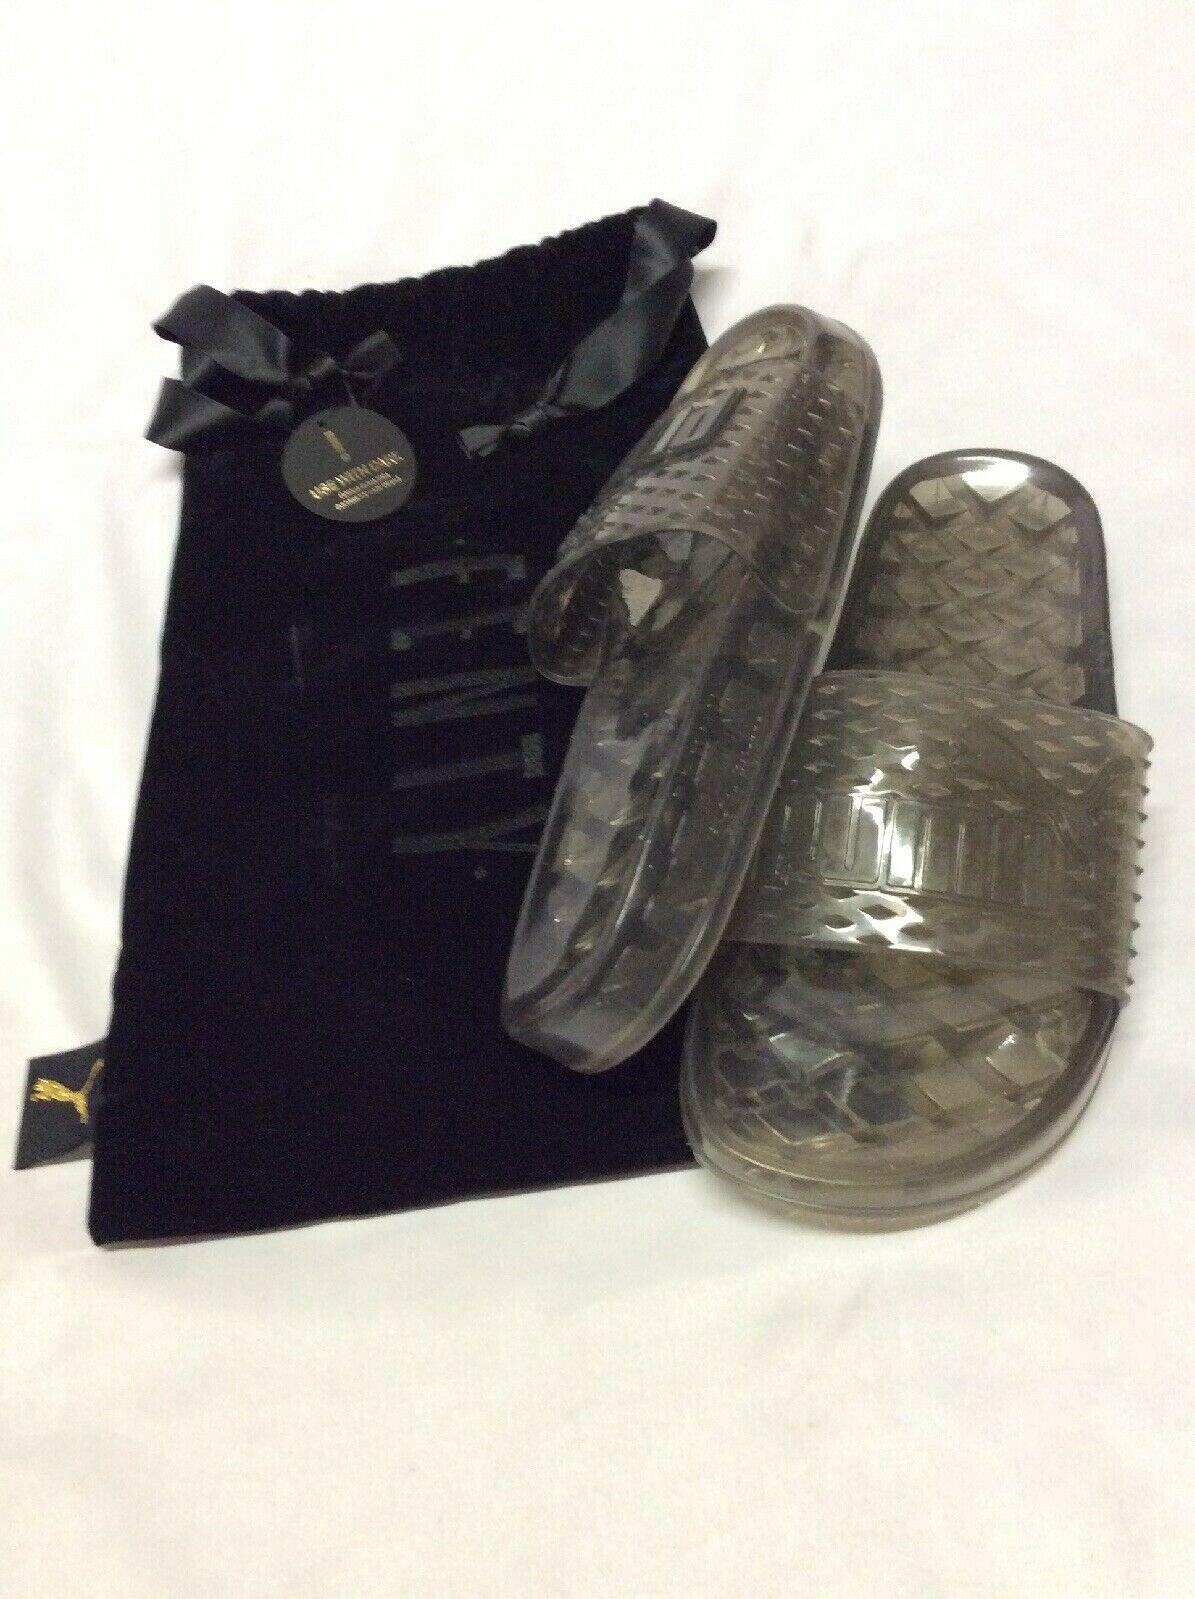 Puma Fenty By Rihanna Women's Slide Sandals,Black Clear, Size 7.5 Eur 38 UK  5